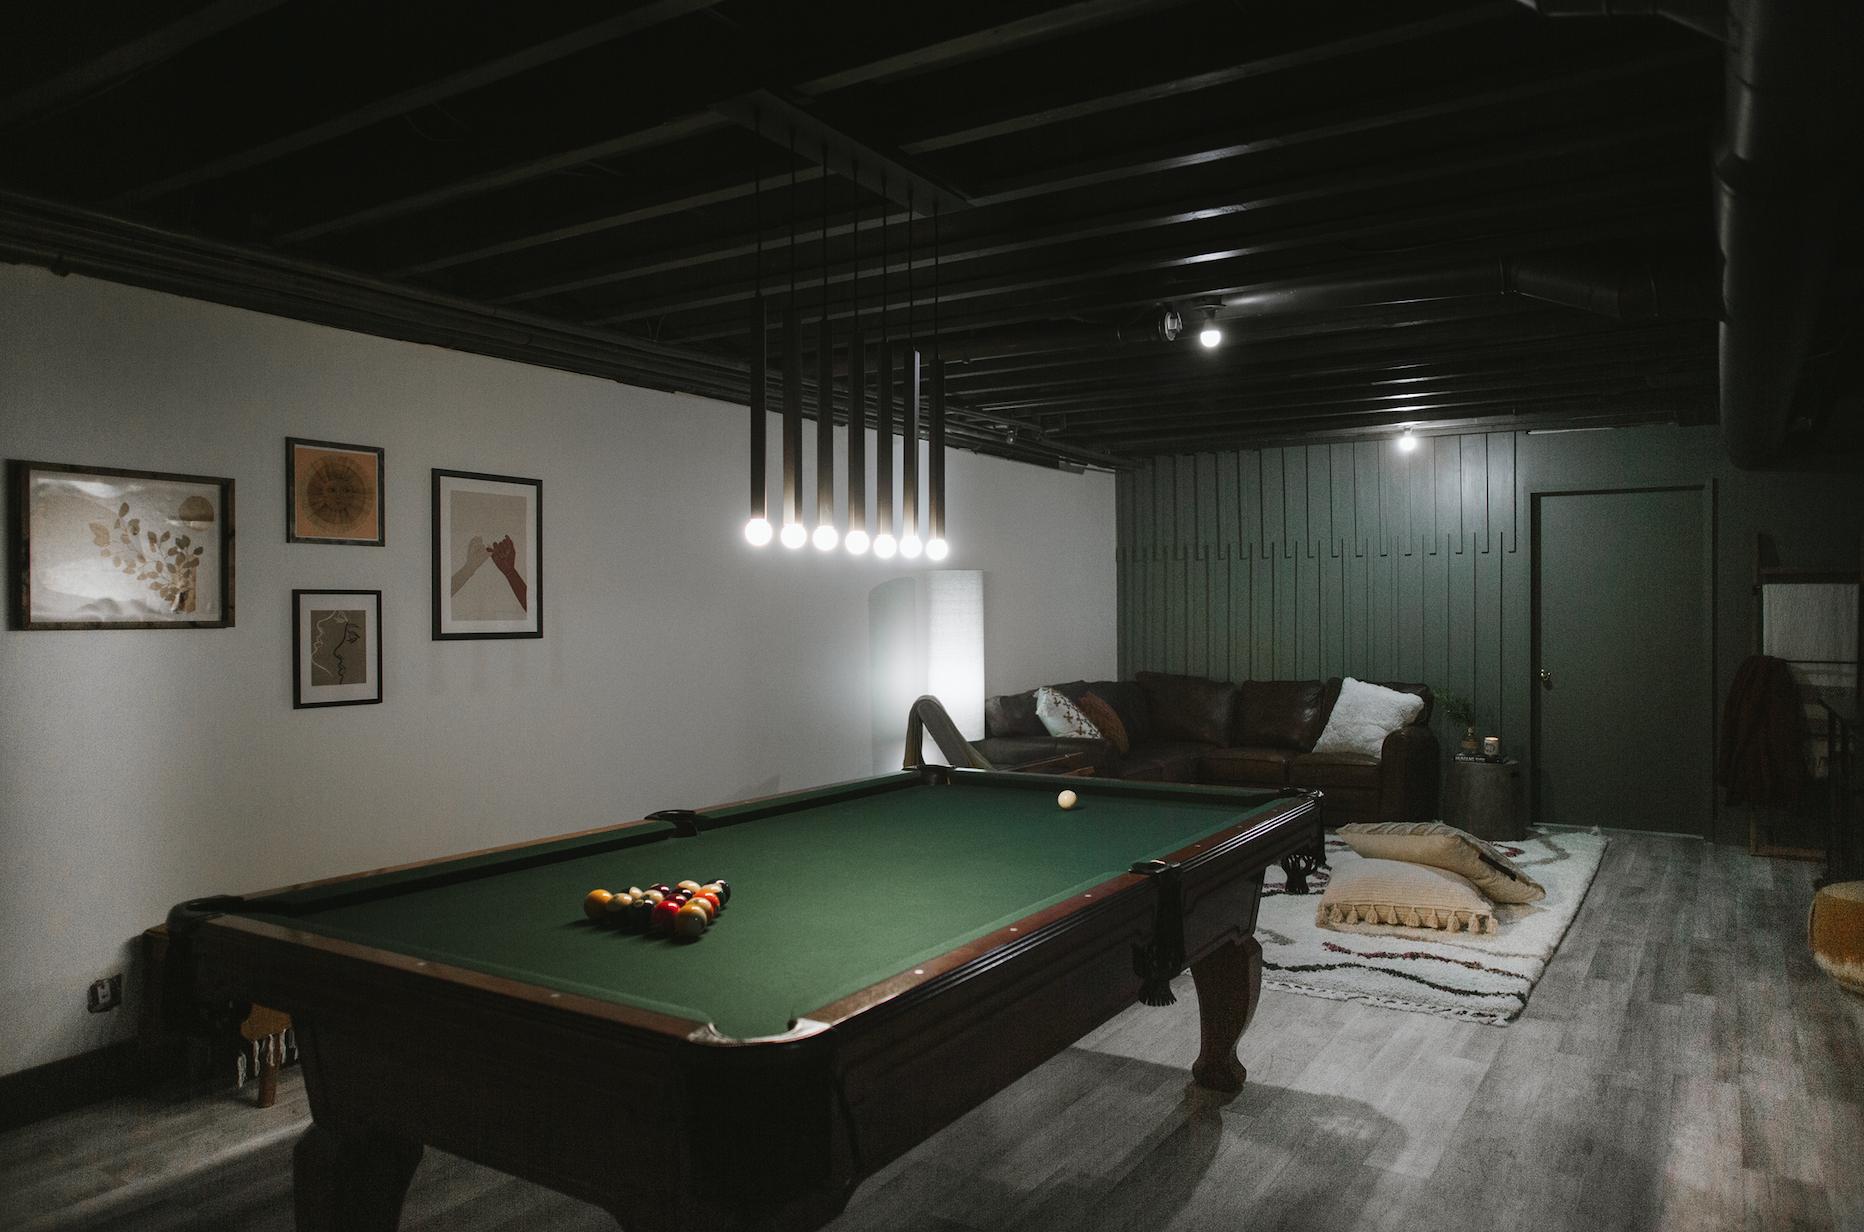 Basement game room renovation One Room challenge